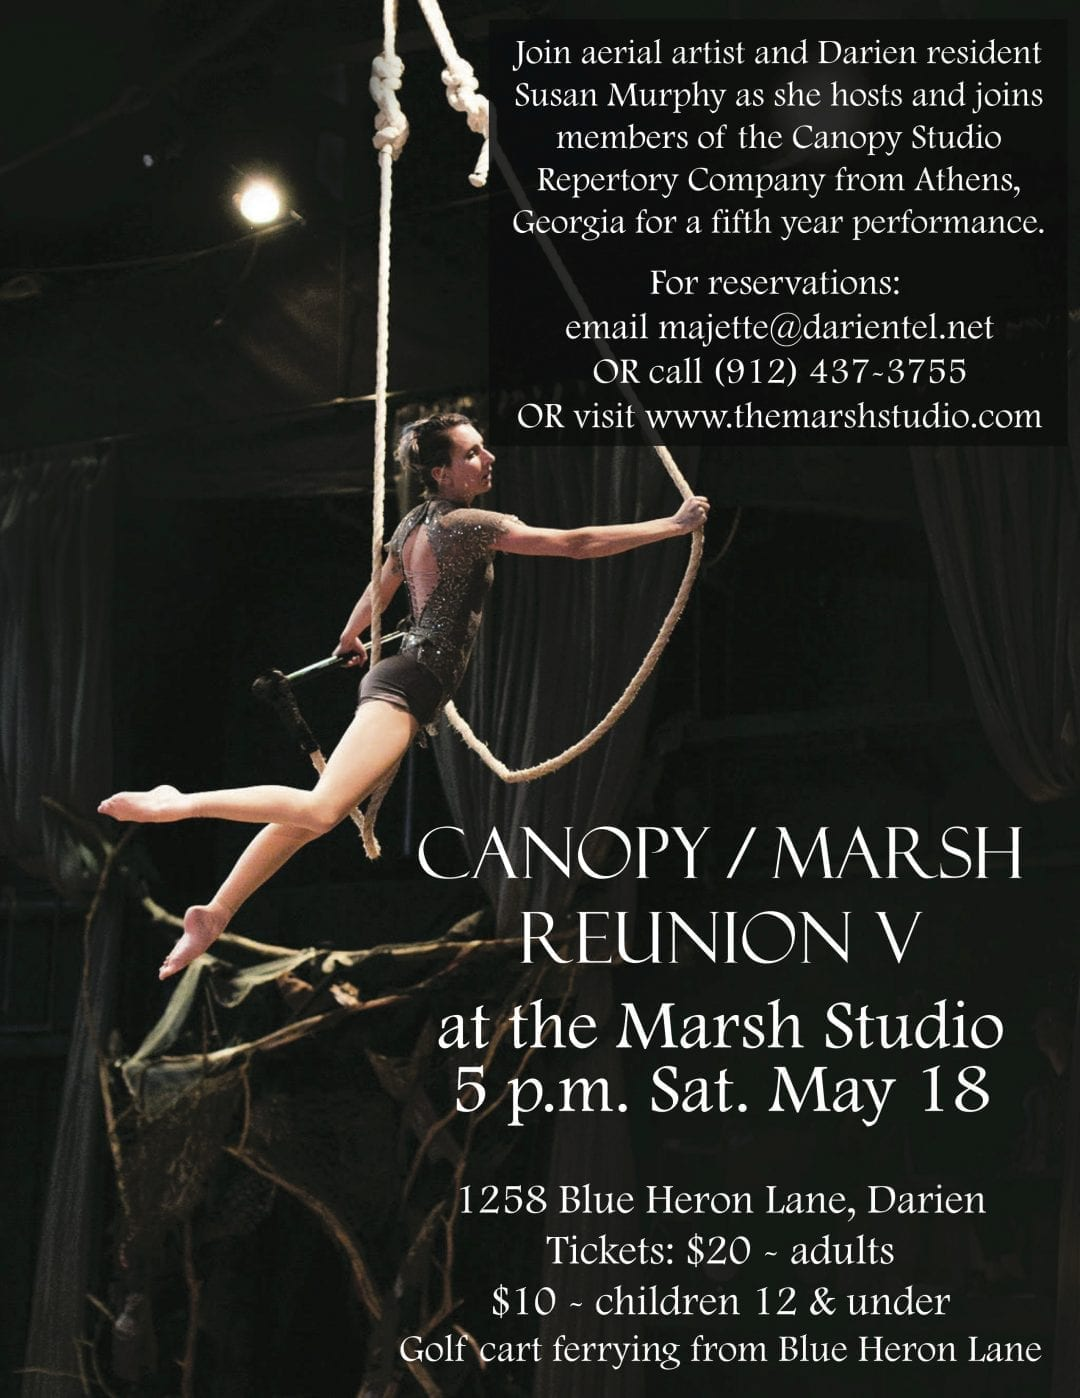 Canopy March Reunion V